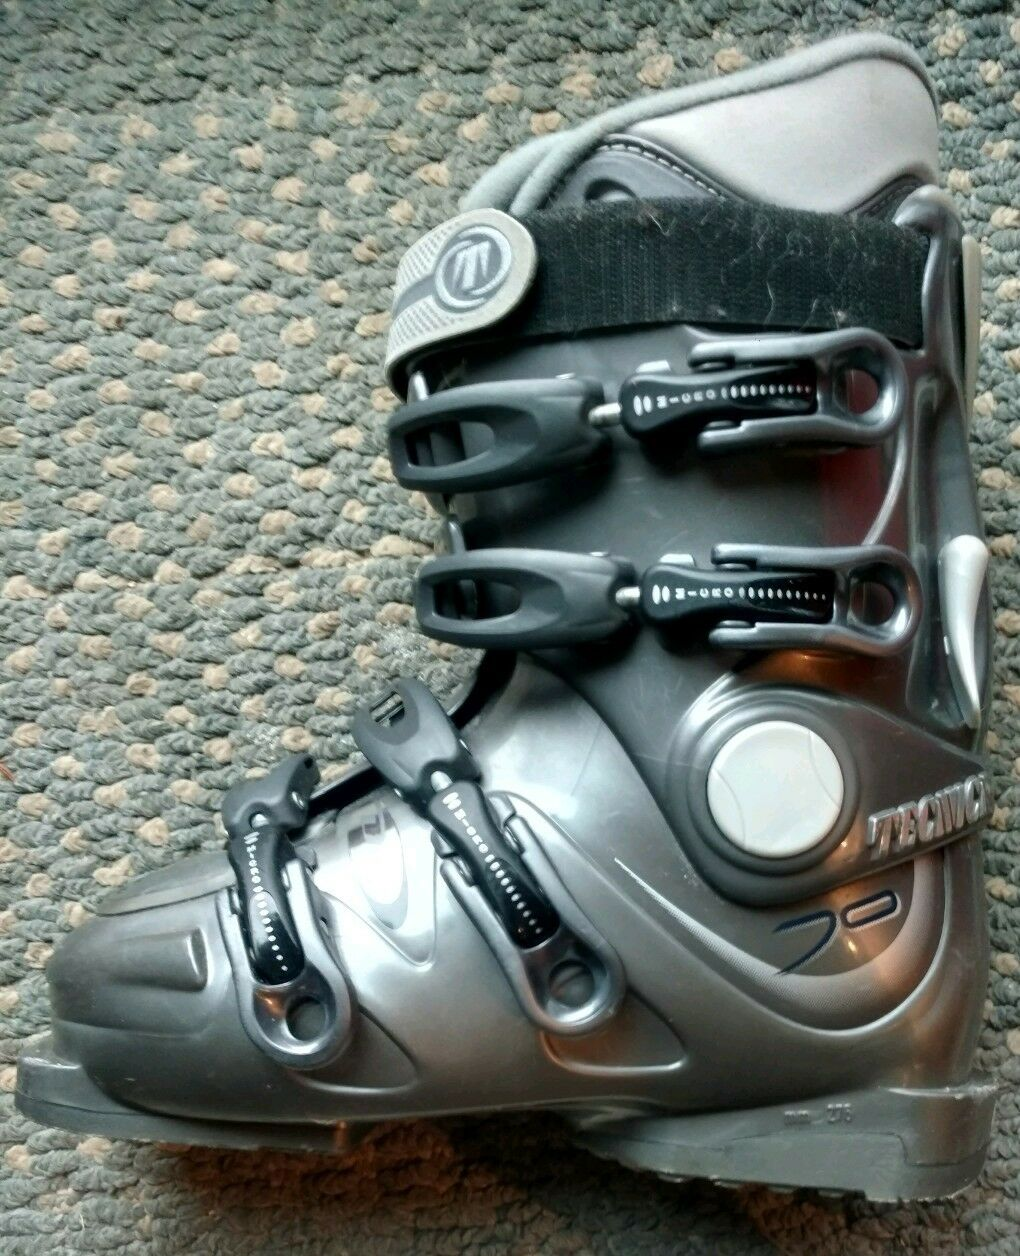 Tecnica Duo 70 Women's Downhill Ski Boots +Run Walk Switch US 6.5